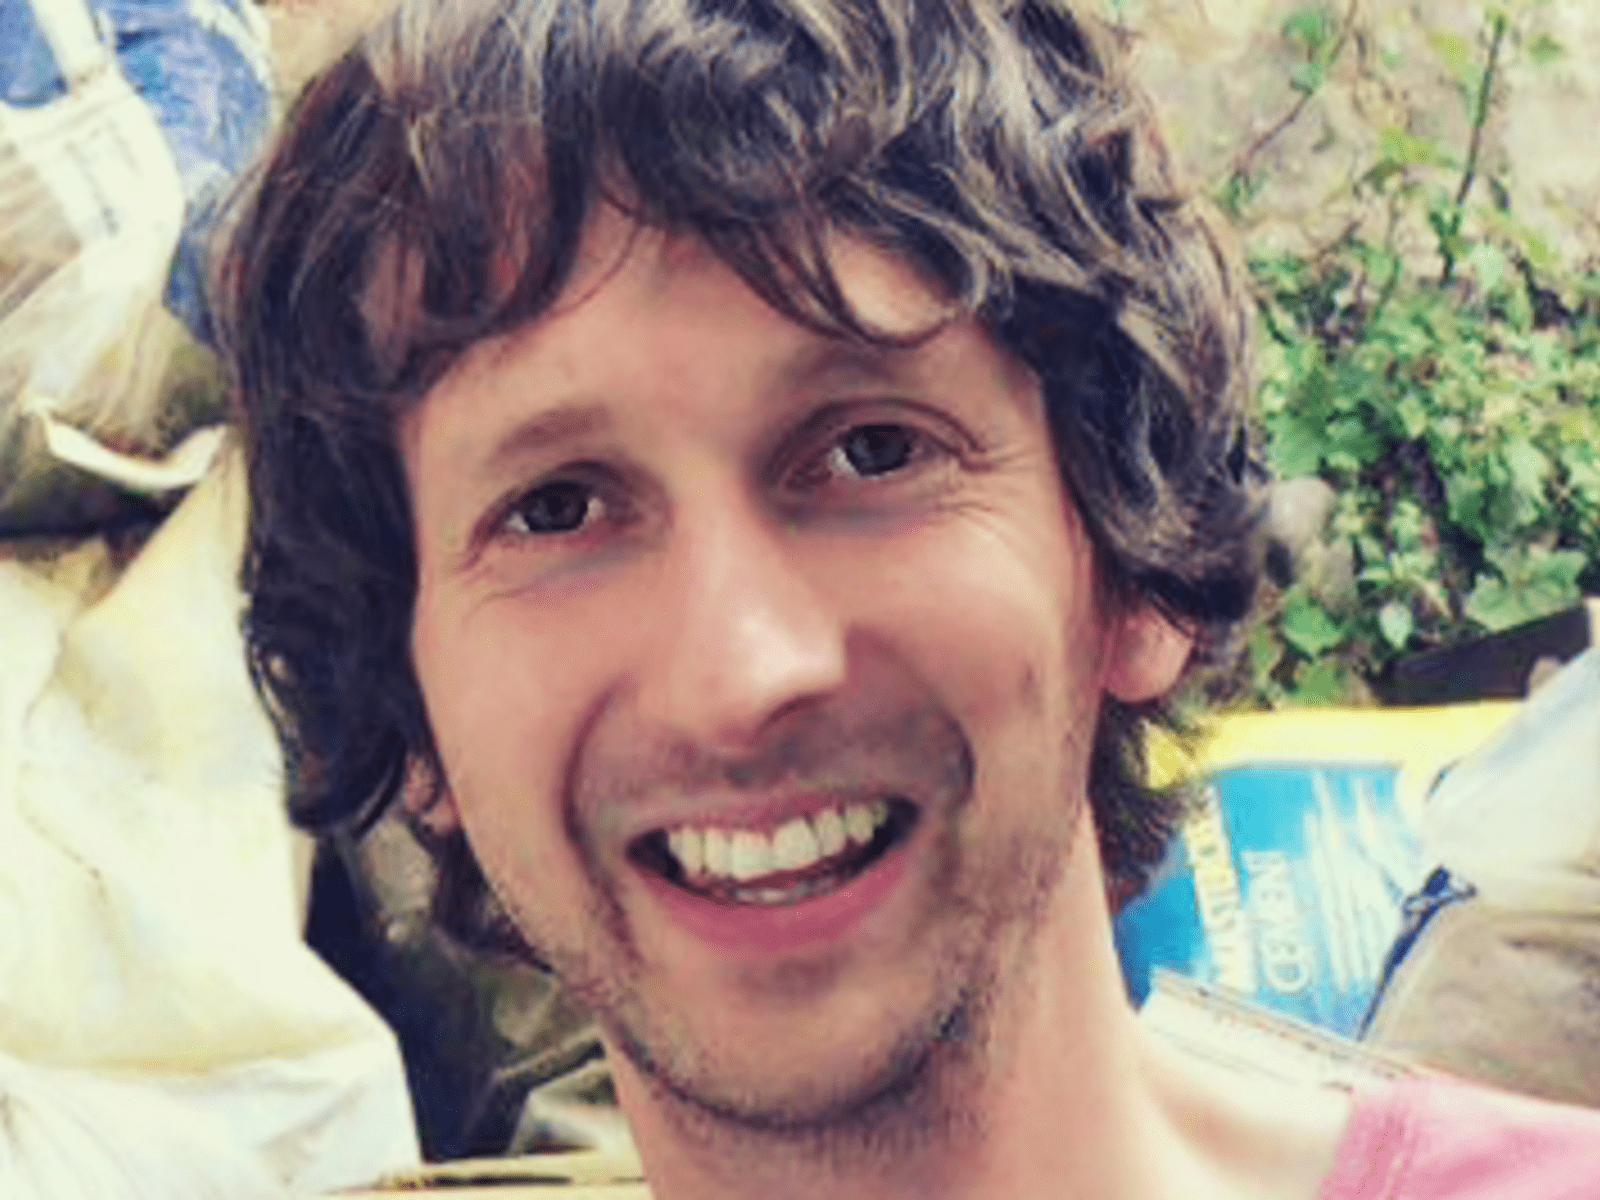 Sam from Brighton, United Kingdom